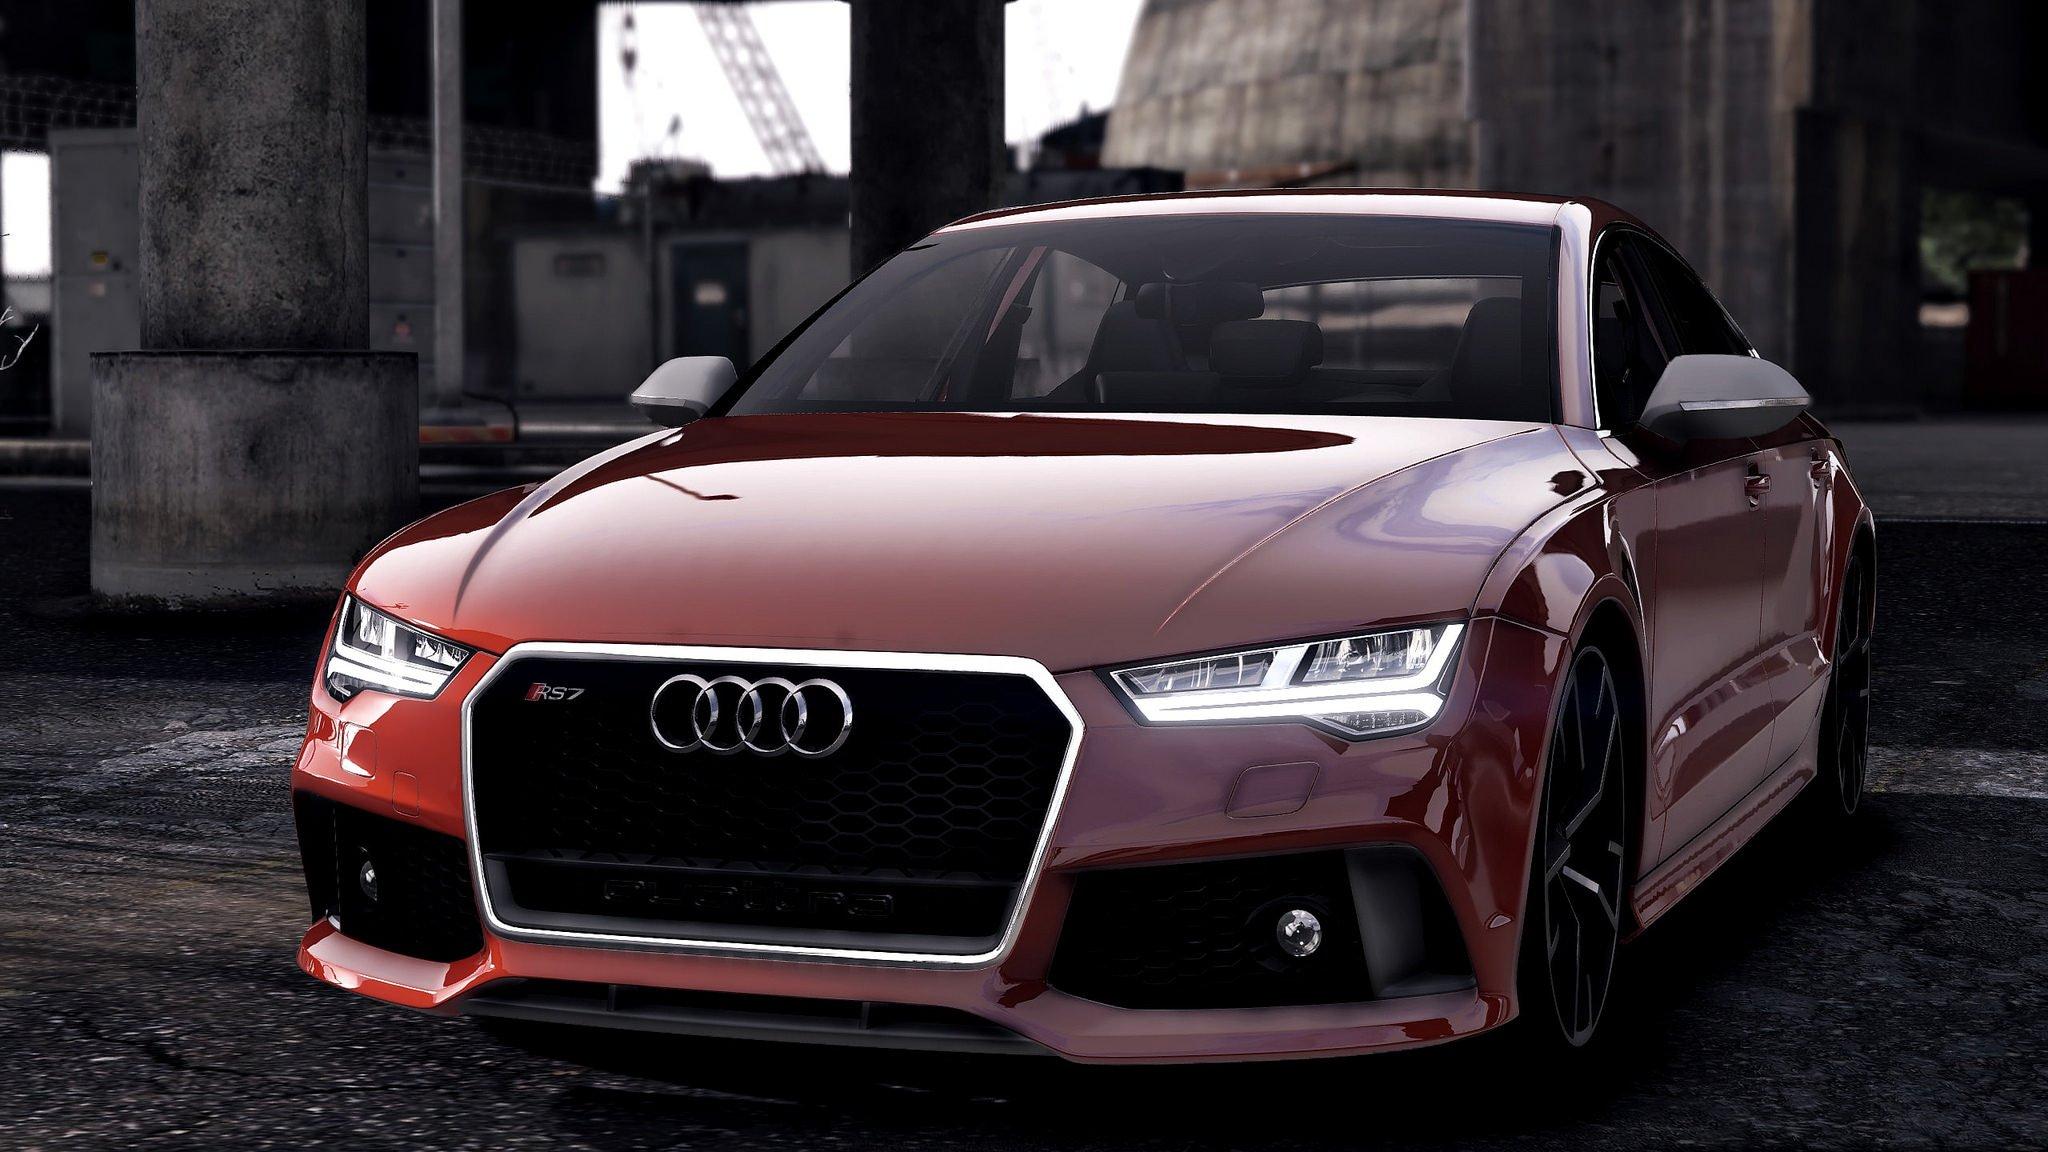 Audi Rs7 2017 Interior >> Audi RS7 Sportback [Add-On / Replace] - GTA5-Mods.com